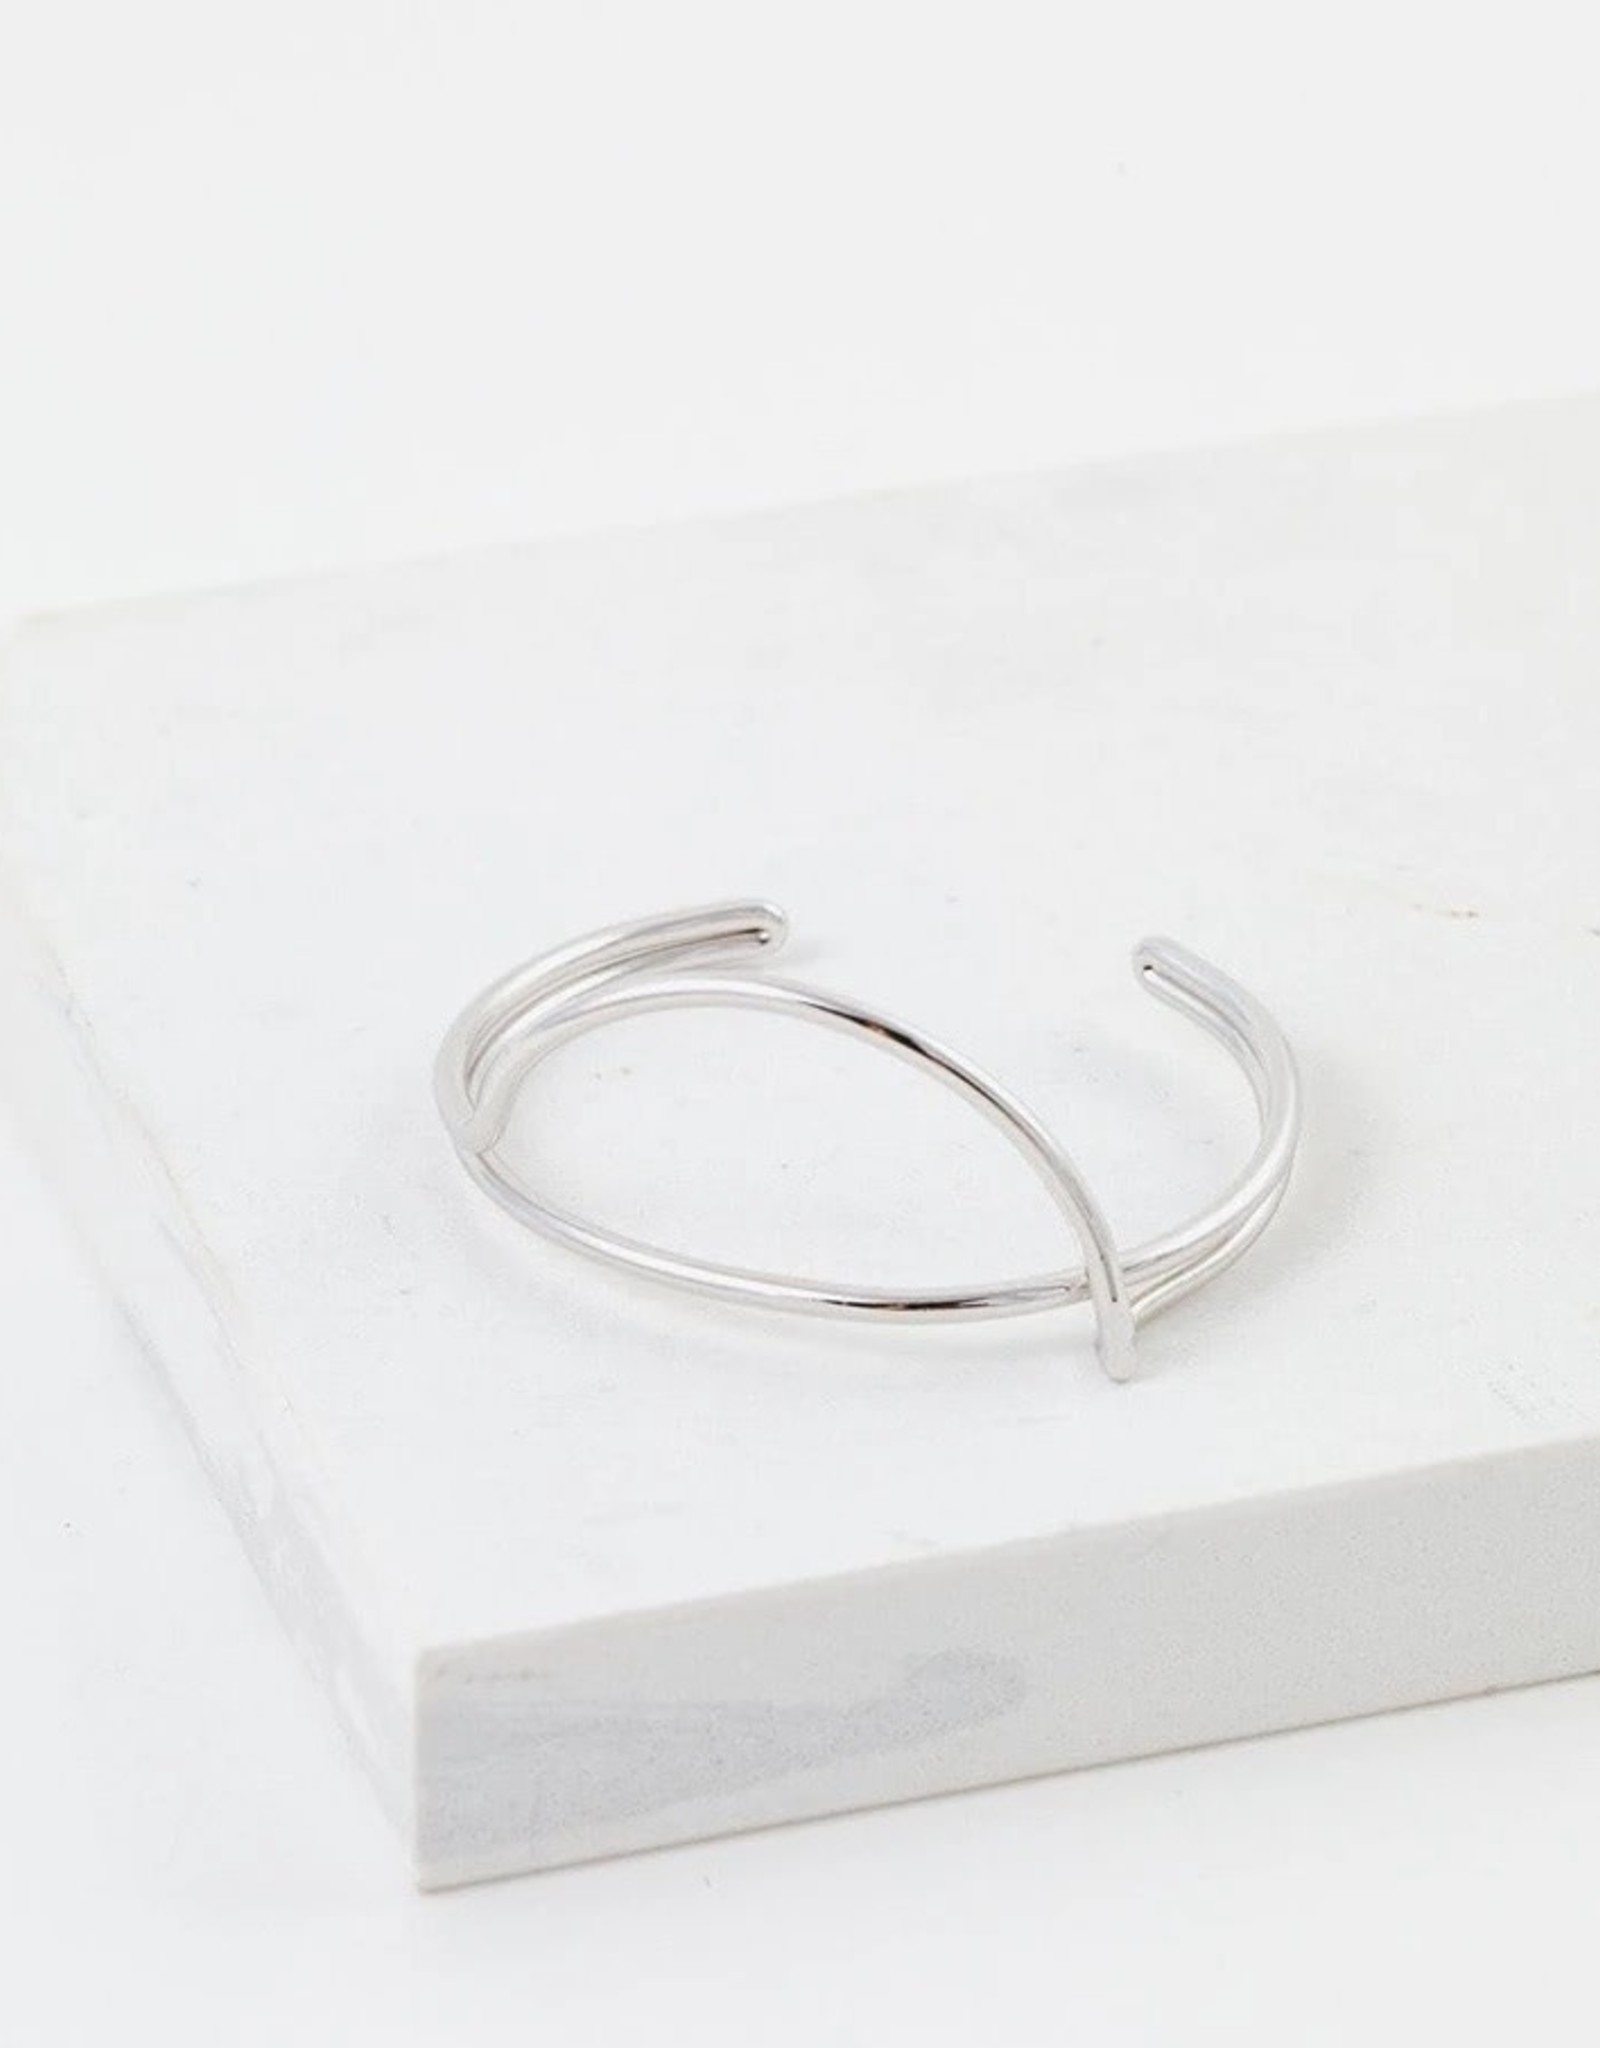 Bracelet, Bangle, Half Moon, Silver Plated Brass